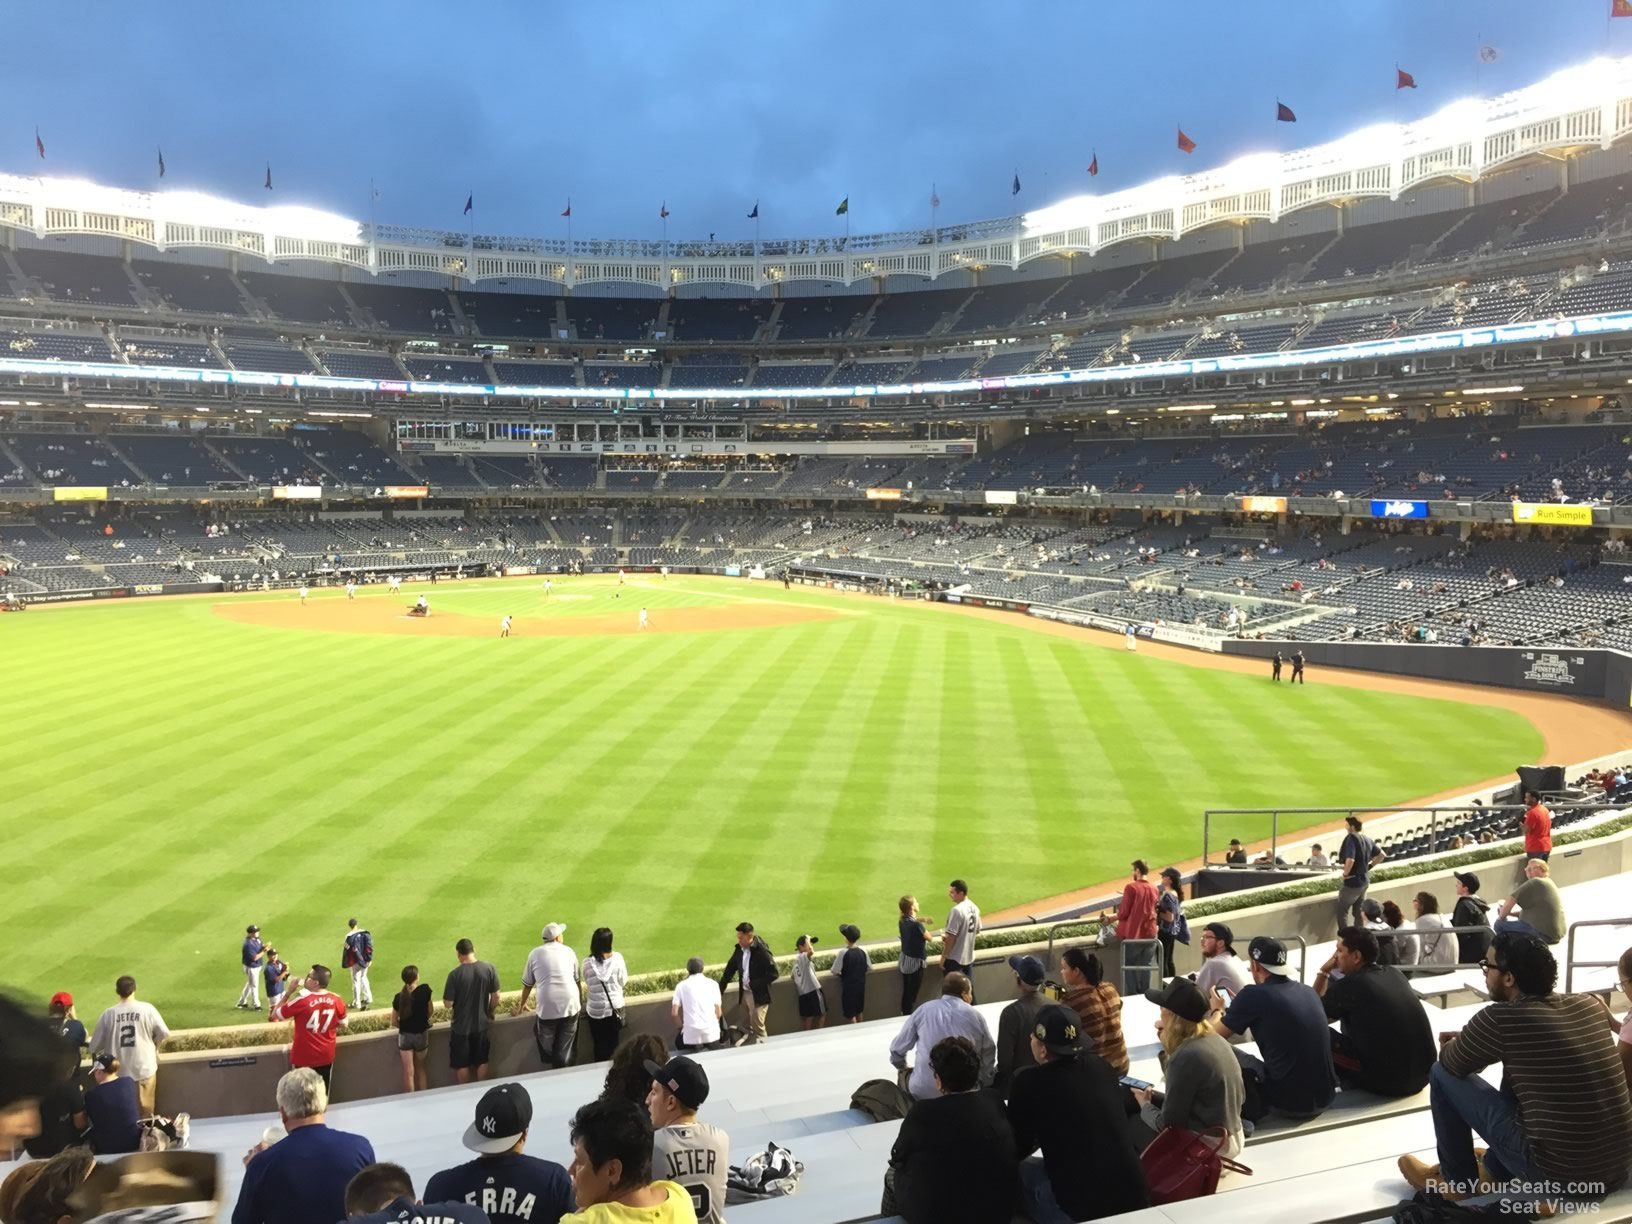 Yankee Stadium Section 238 - New York Yankees - RateYourSeats.com